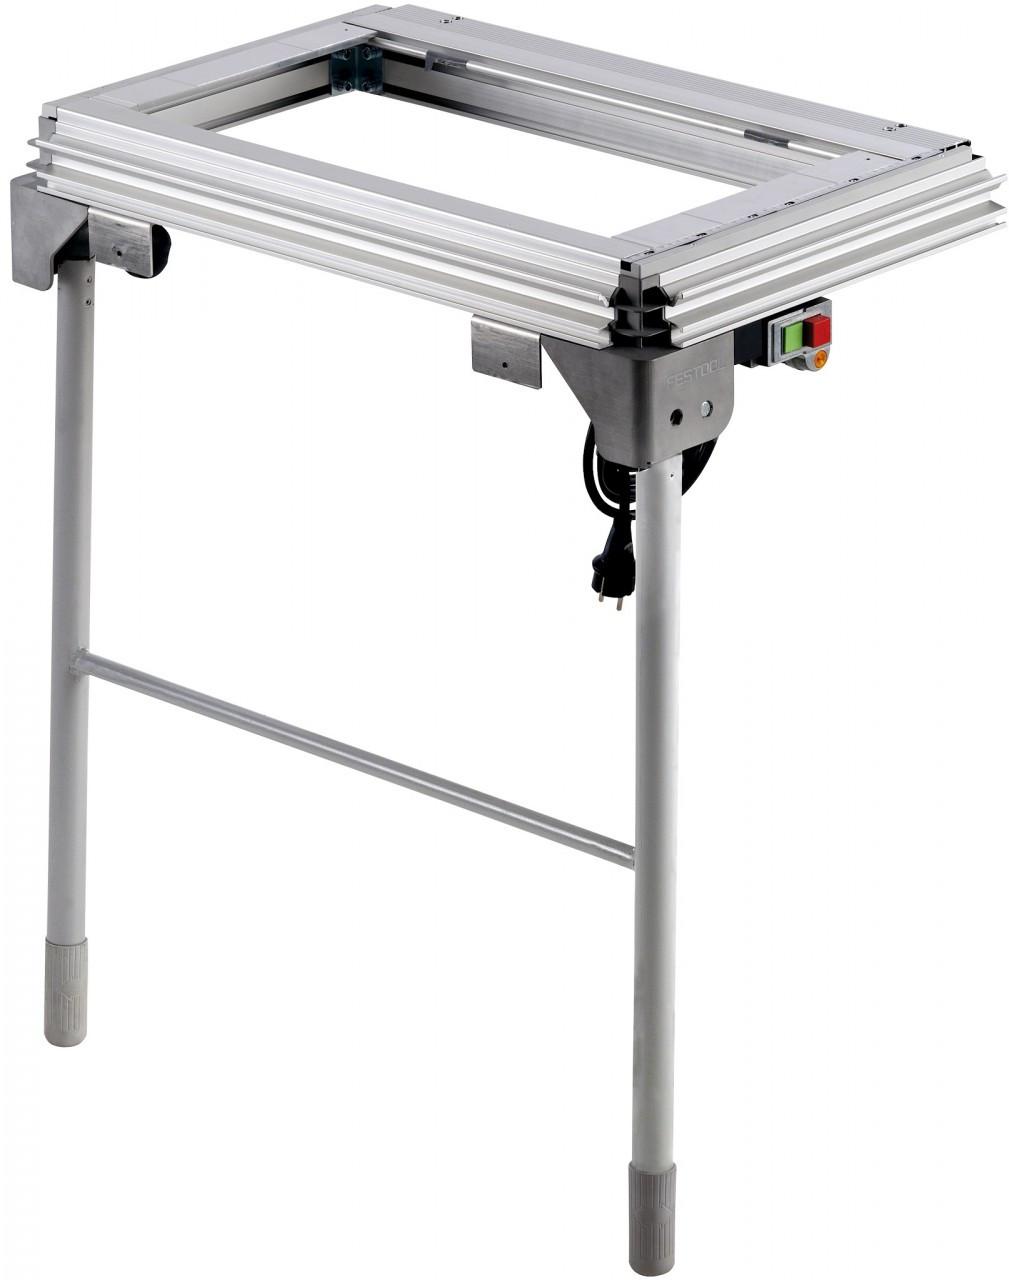 Festool Cms Extension Table